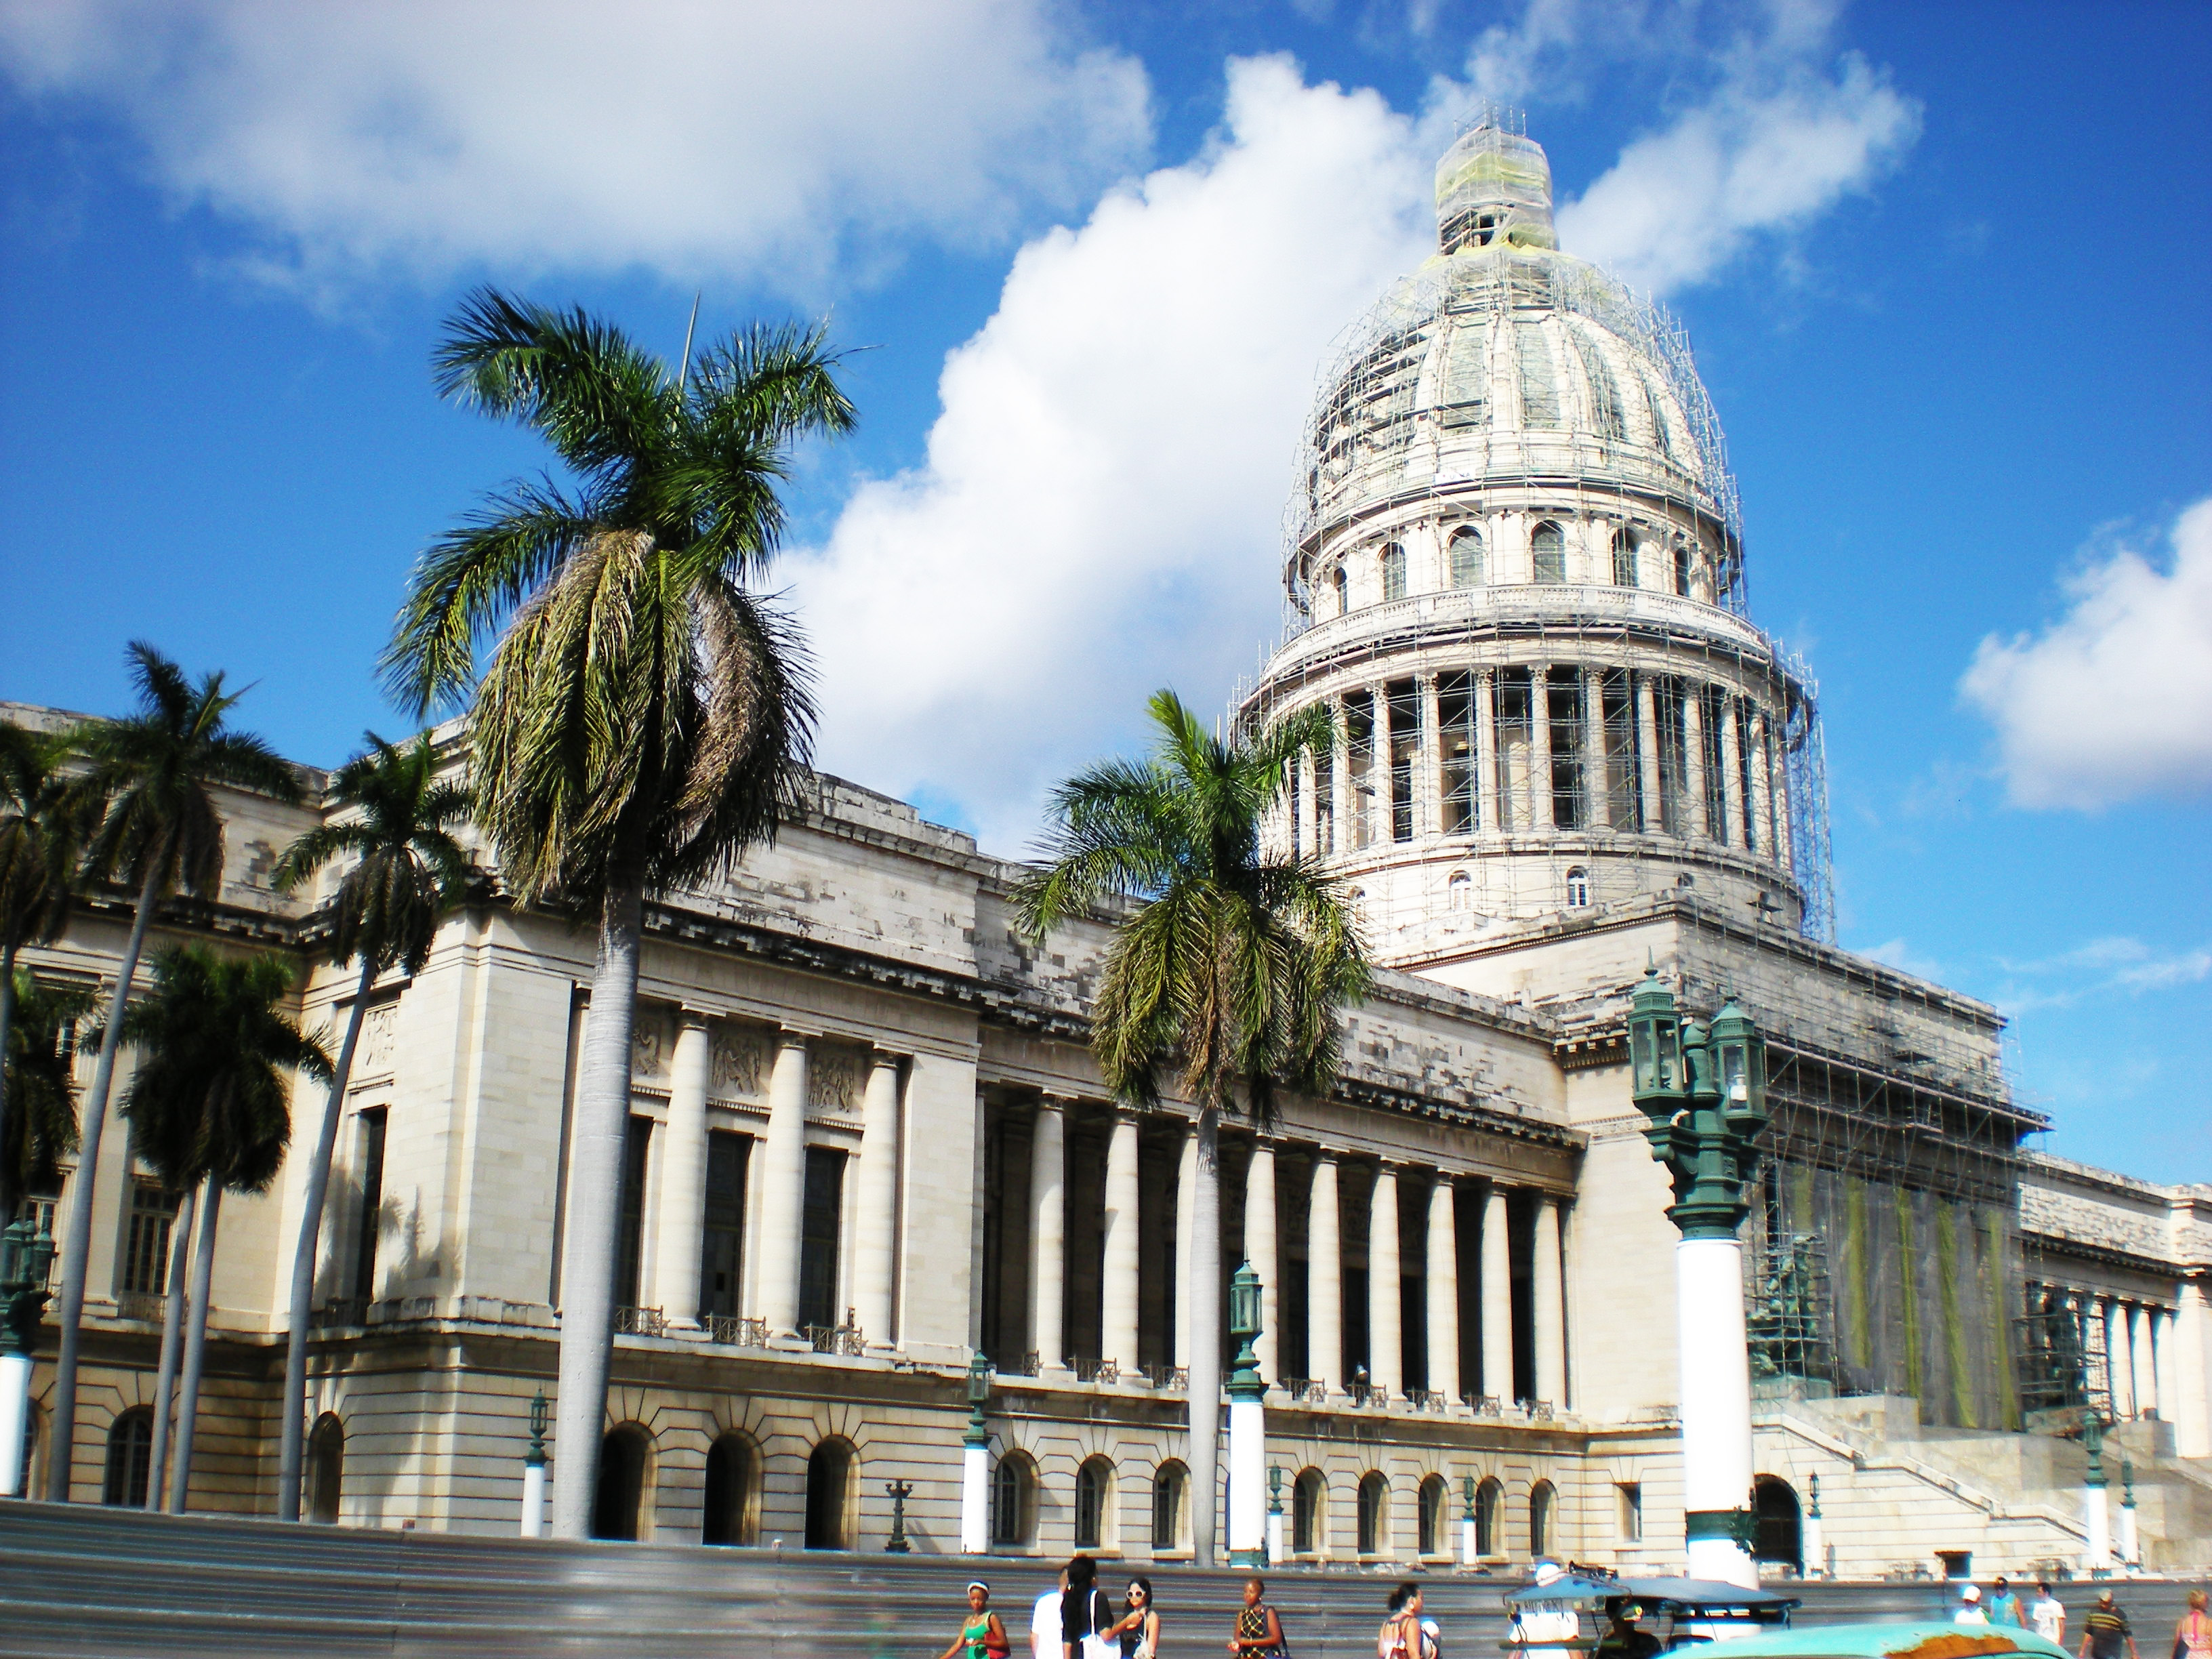 L'Avana - Capitolio Nacional